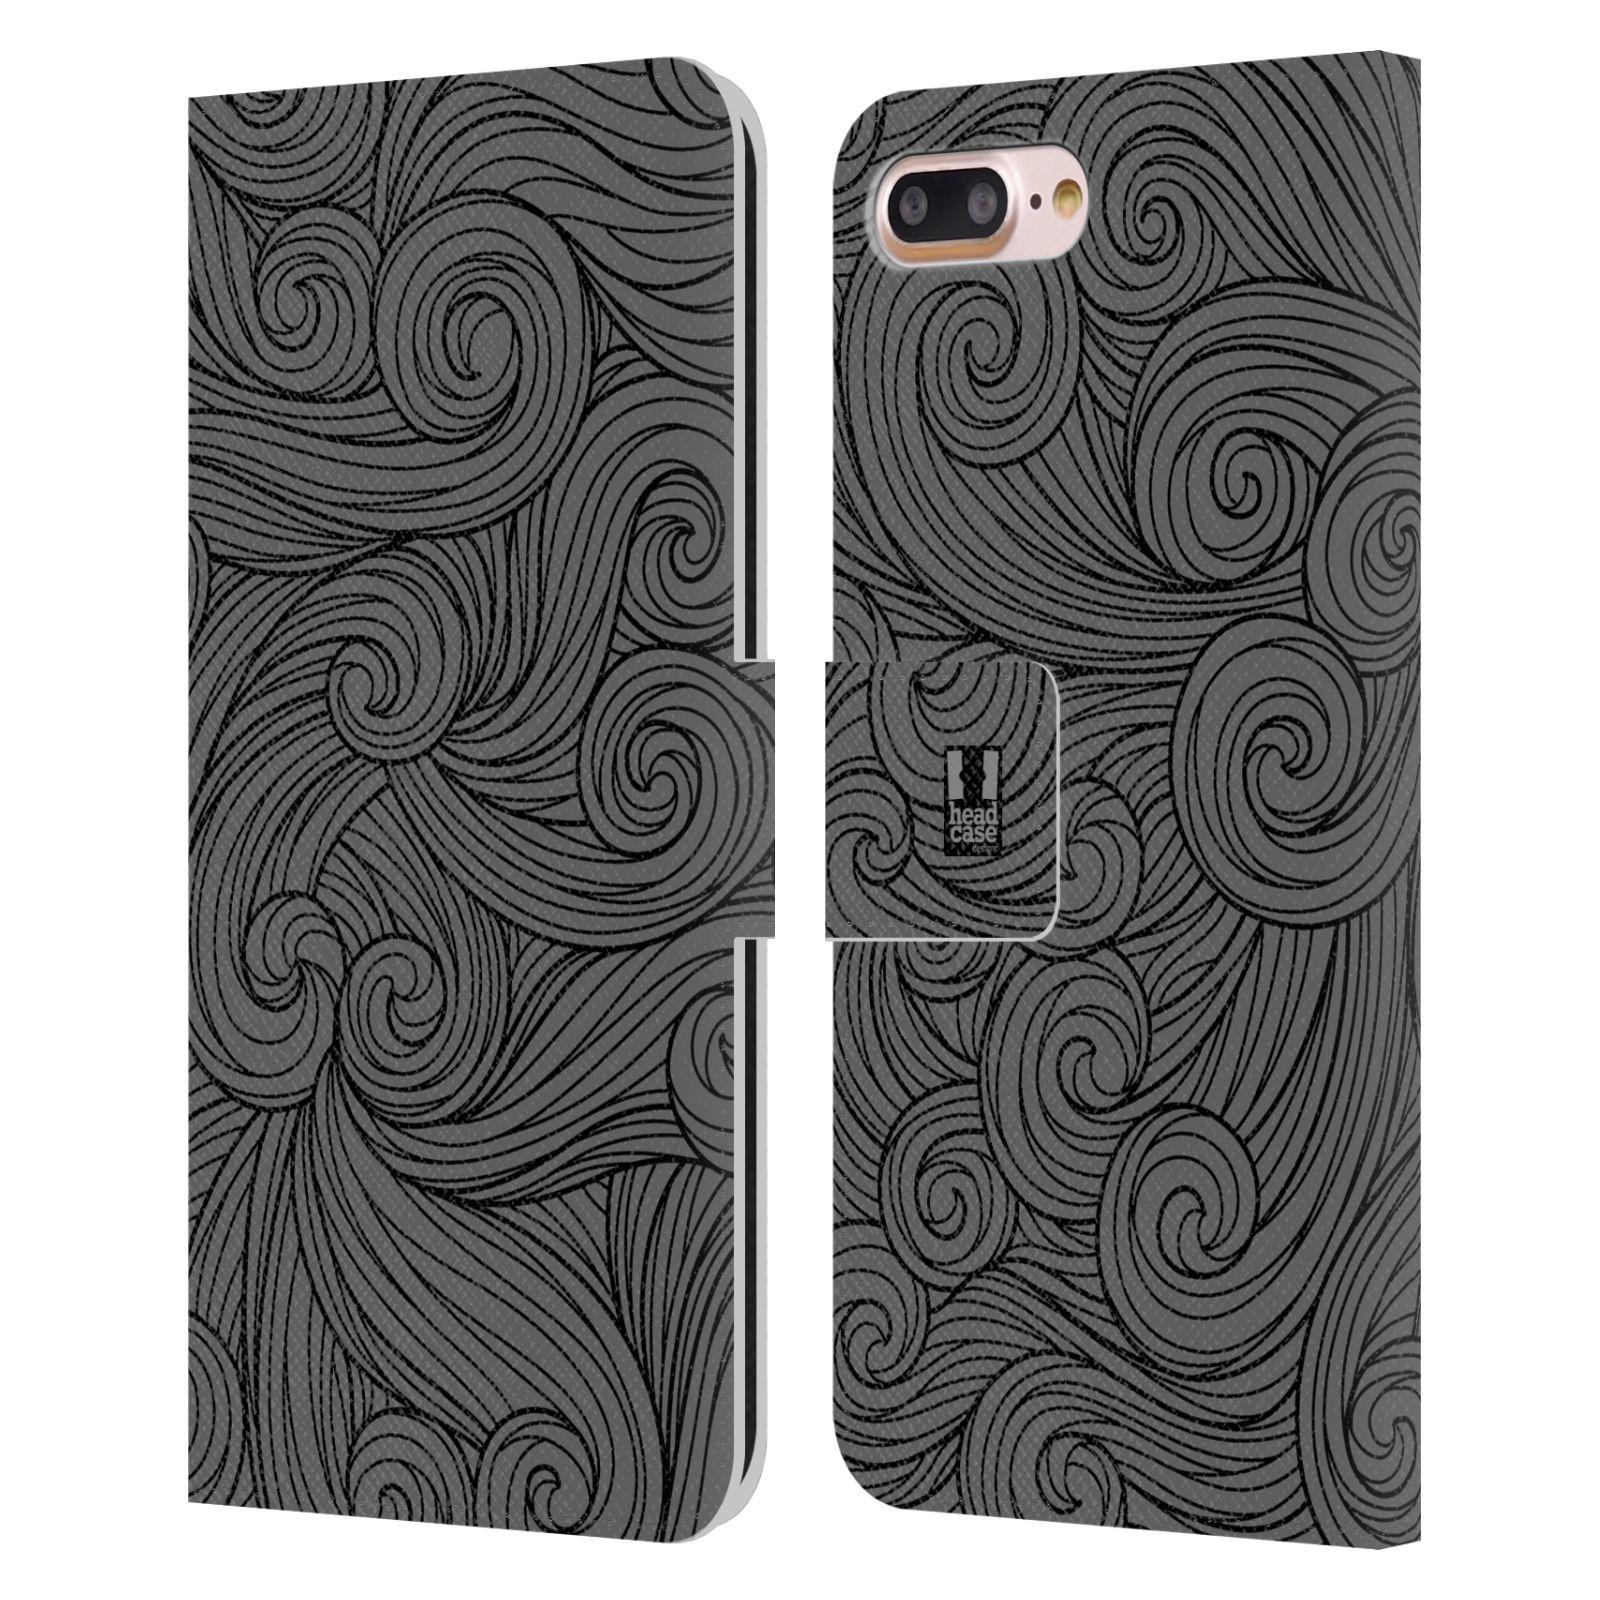 HEAD CASE Flipové pouzdro pro mobil Apple Iphone 7 PLUS / 8 PLUS barevné vlny šedá